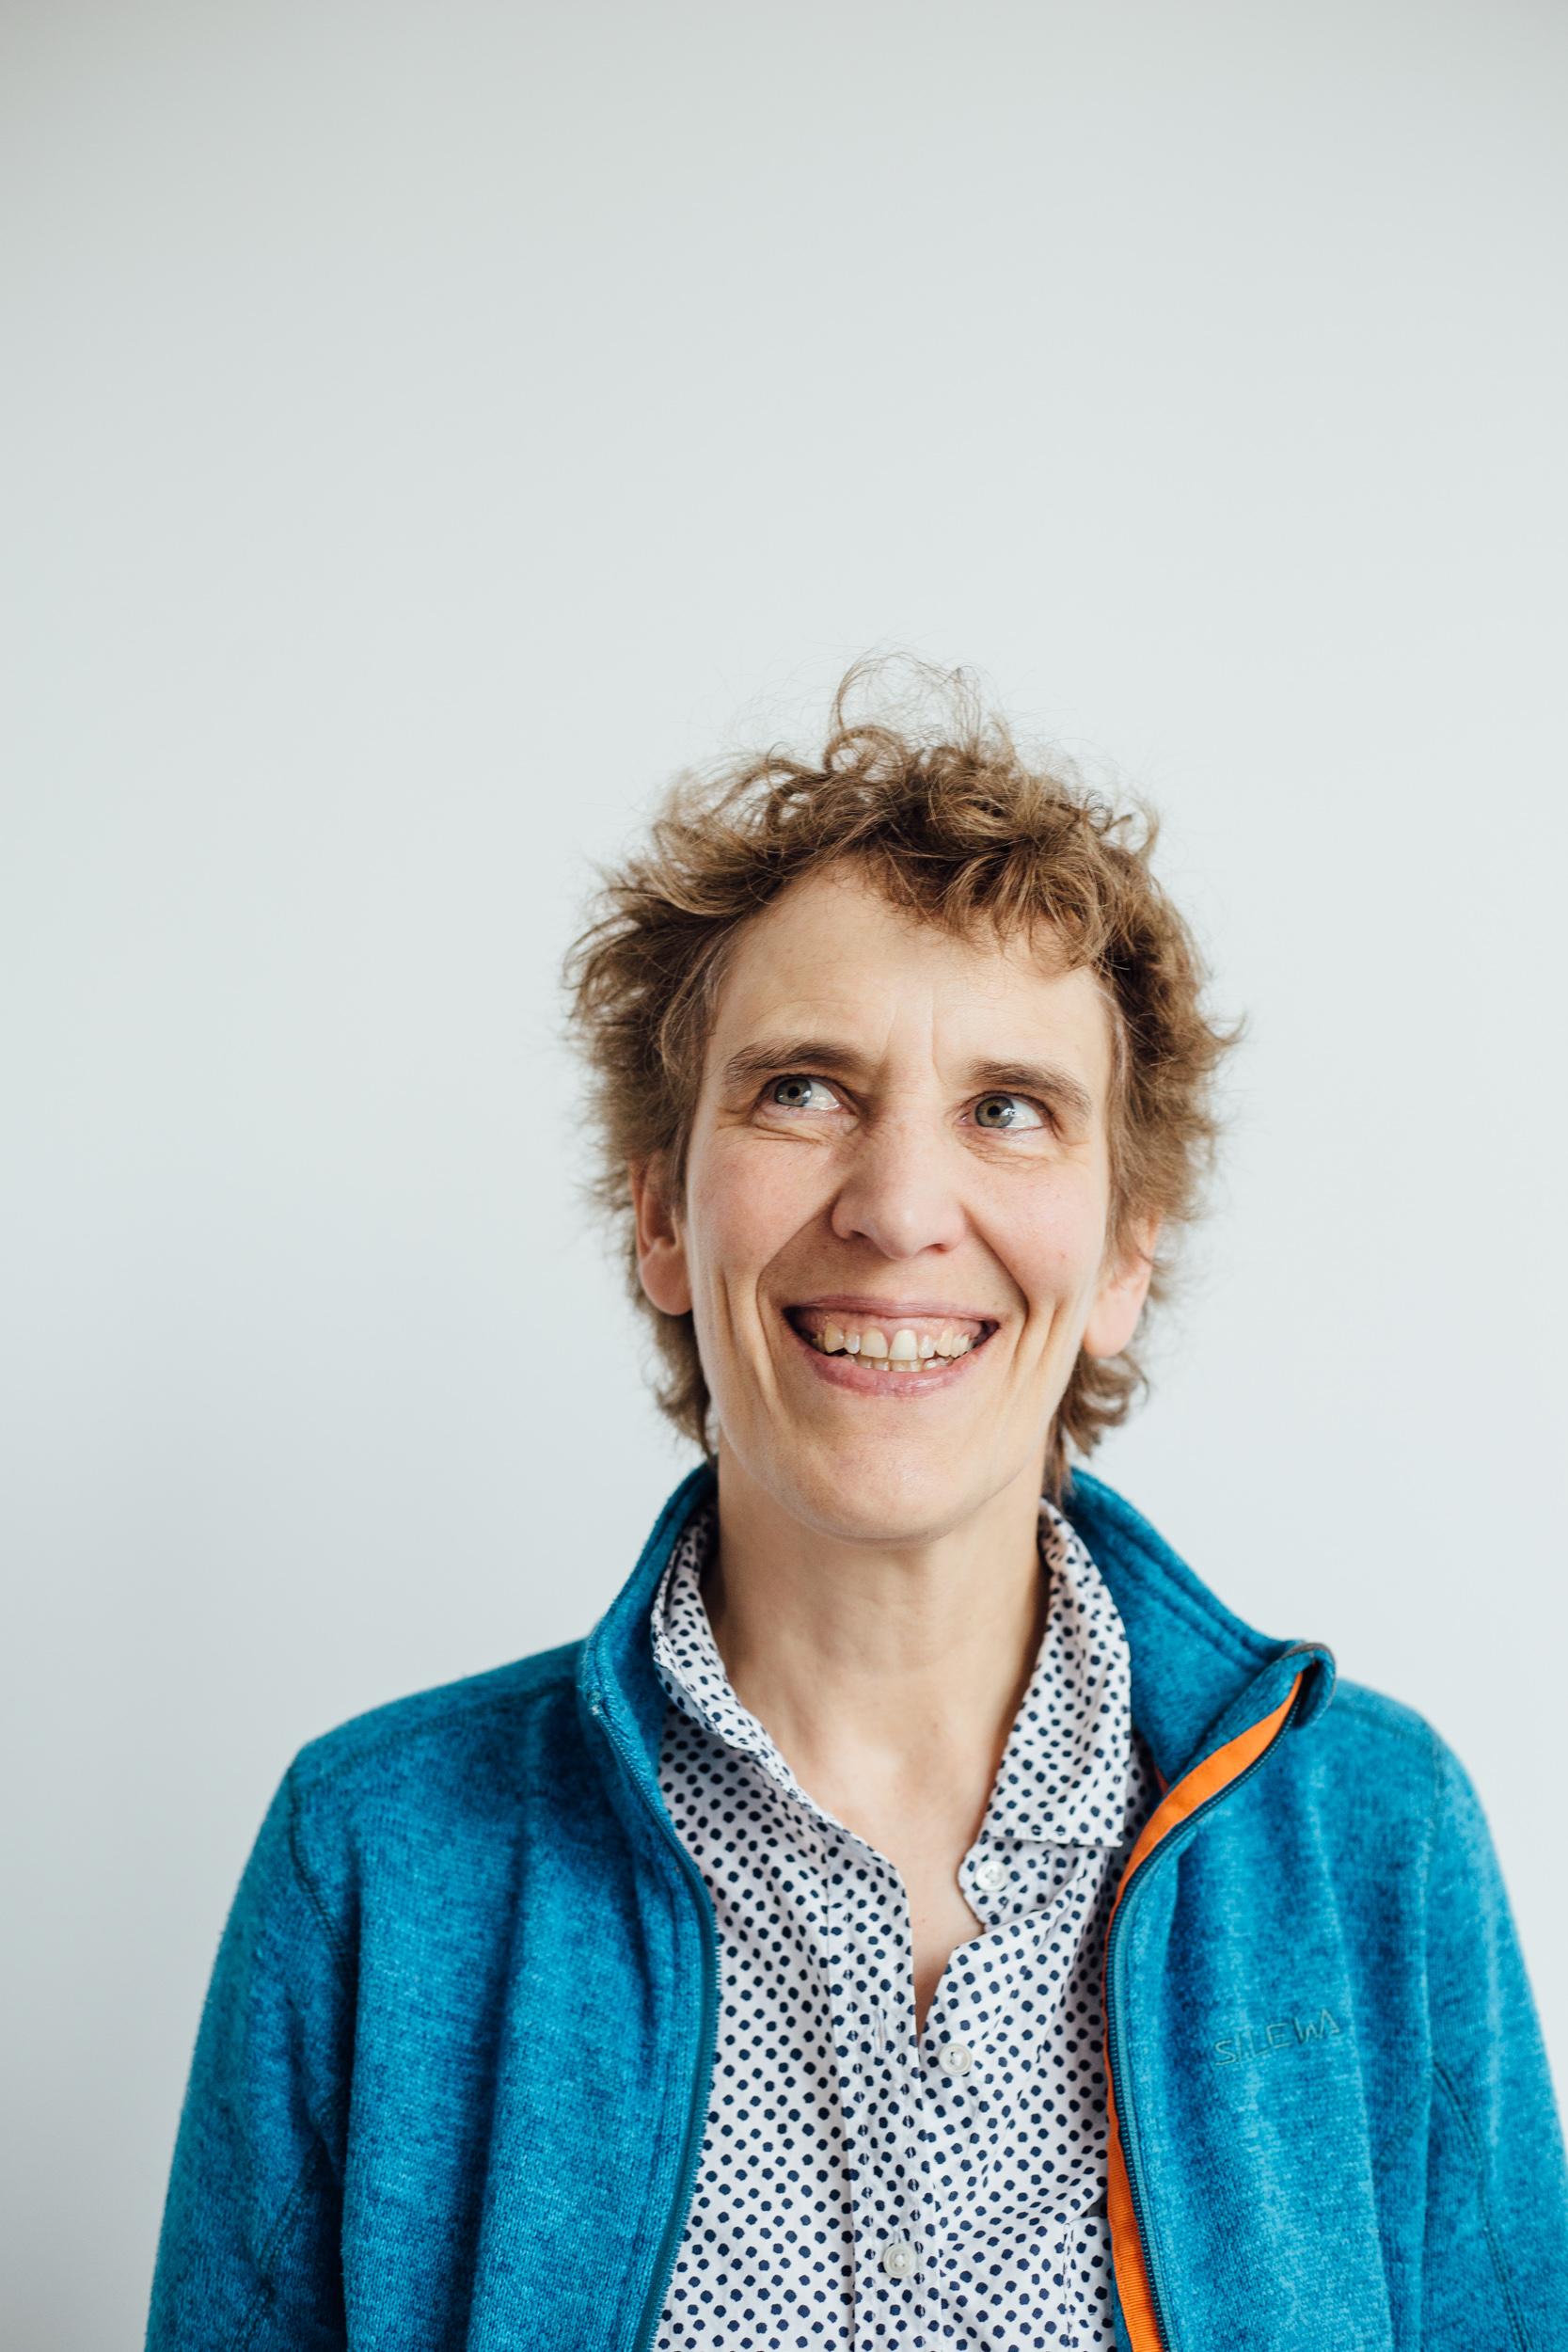 : Heike Tiemann - Professorin for Sportpädagogik